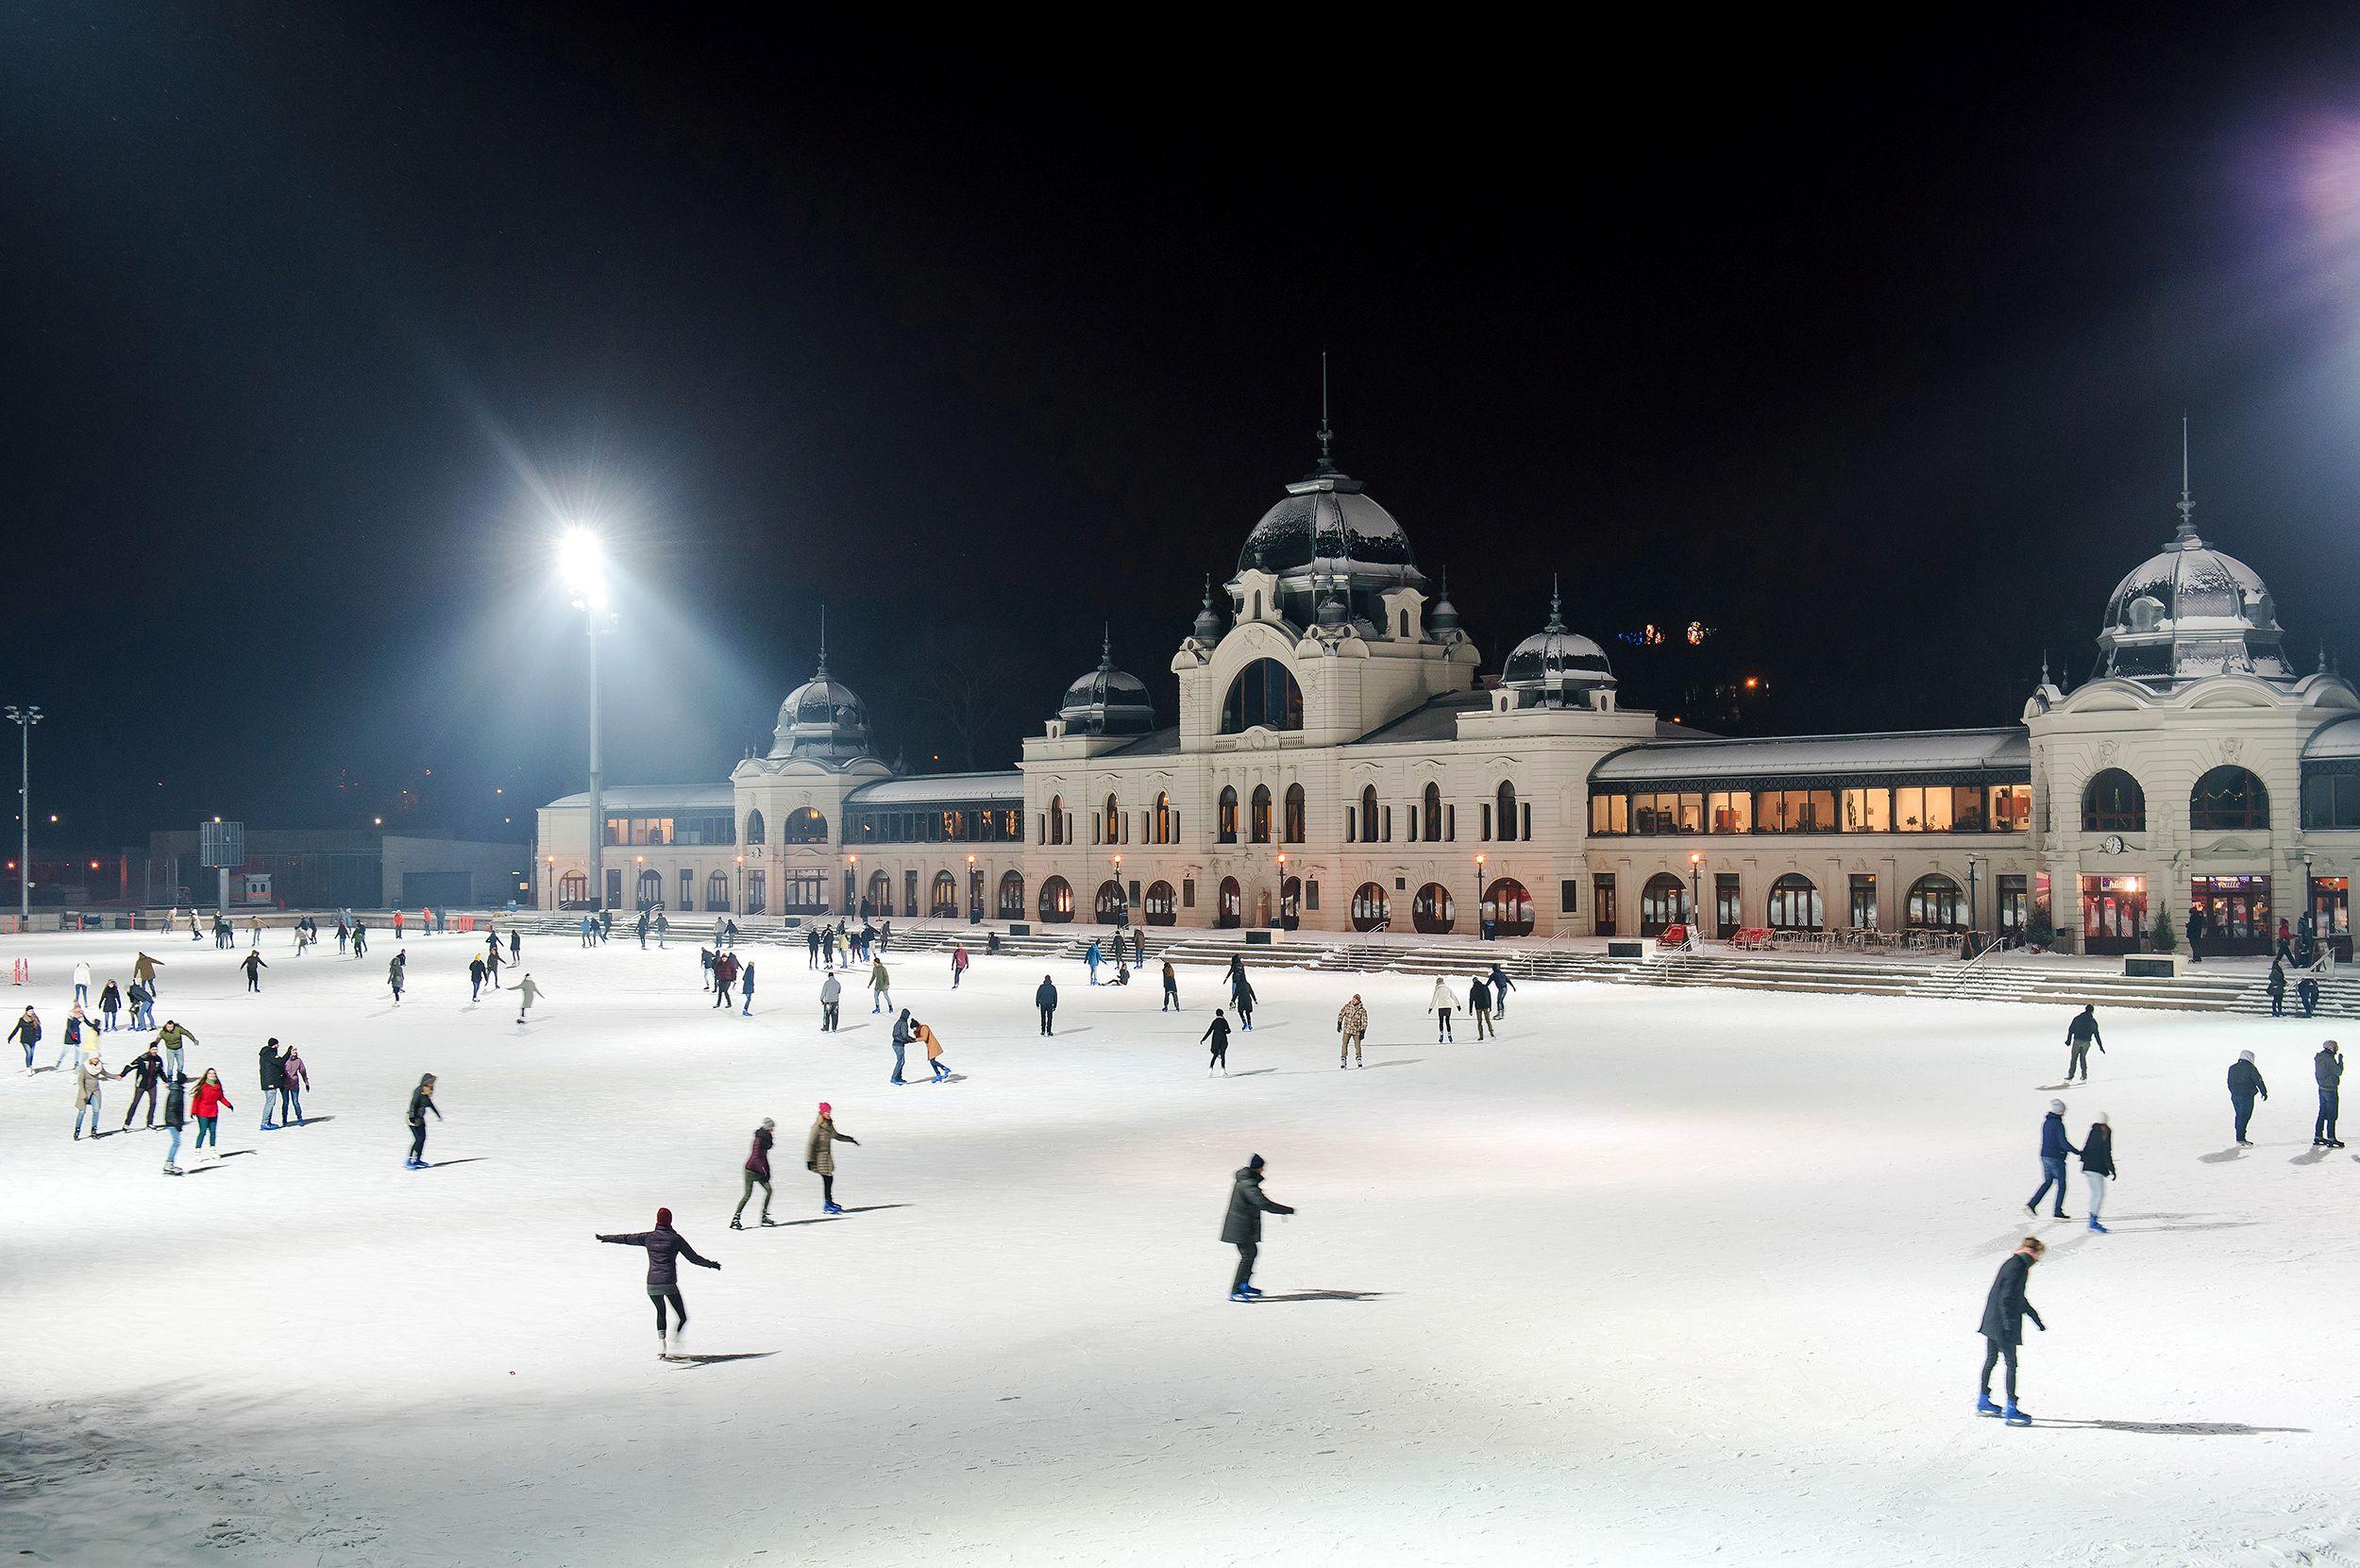 ice-rink-budapest-skate.jpg